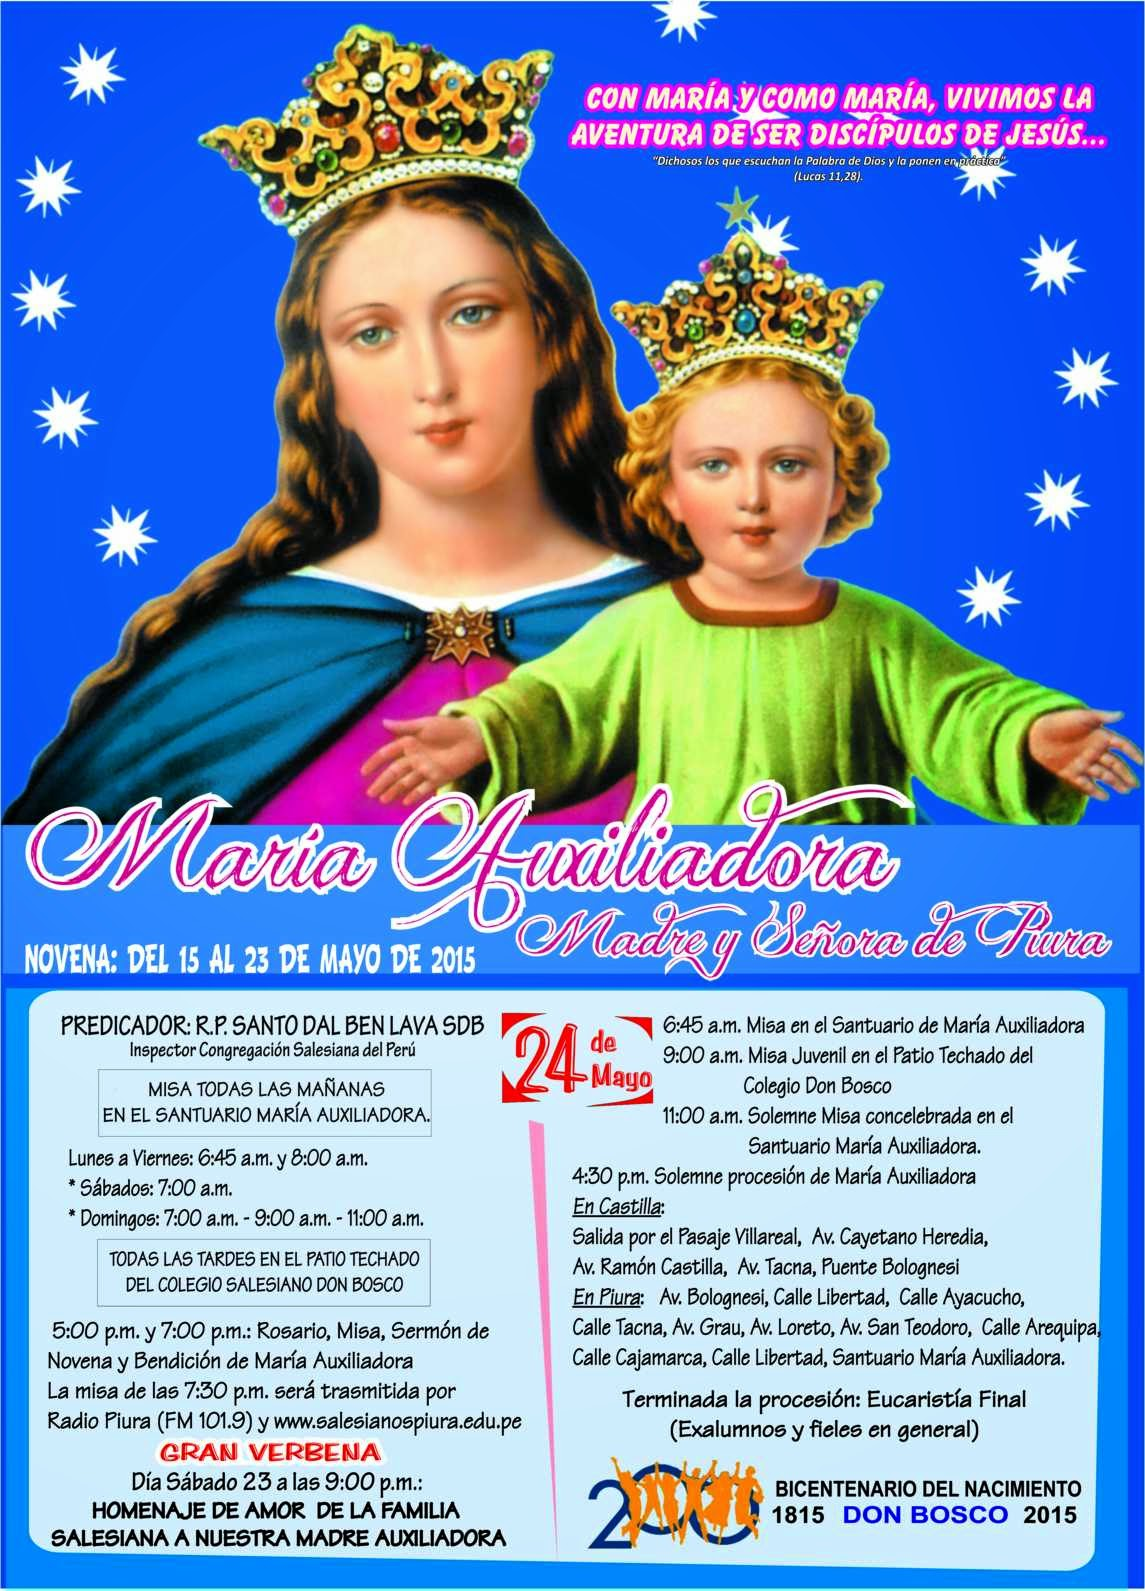 Novena de María Auxiliadora 2015